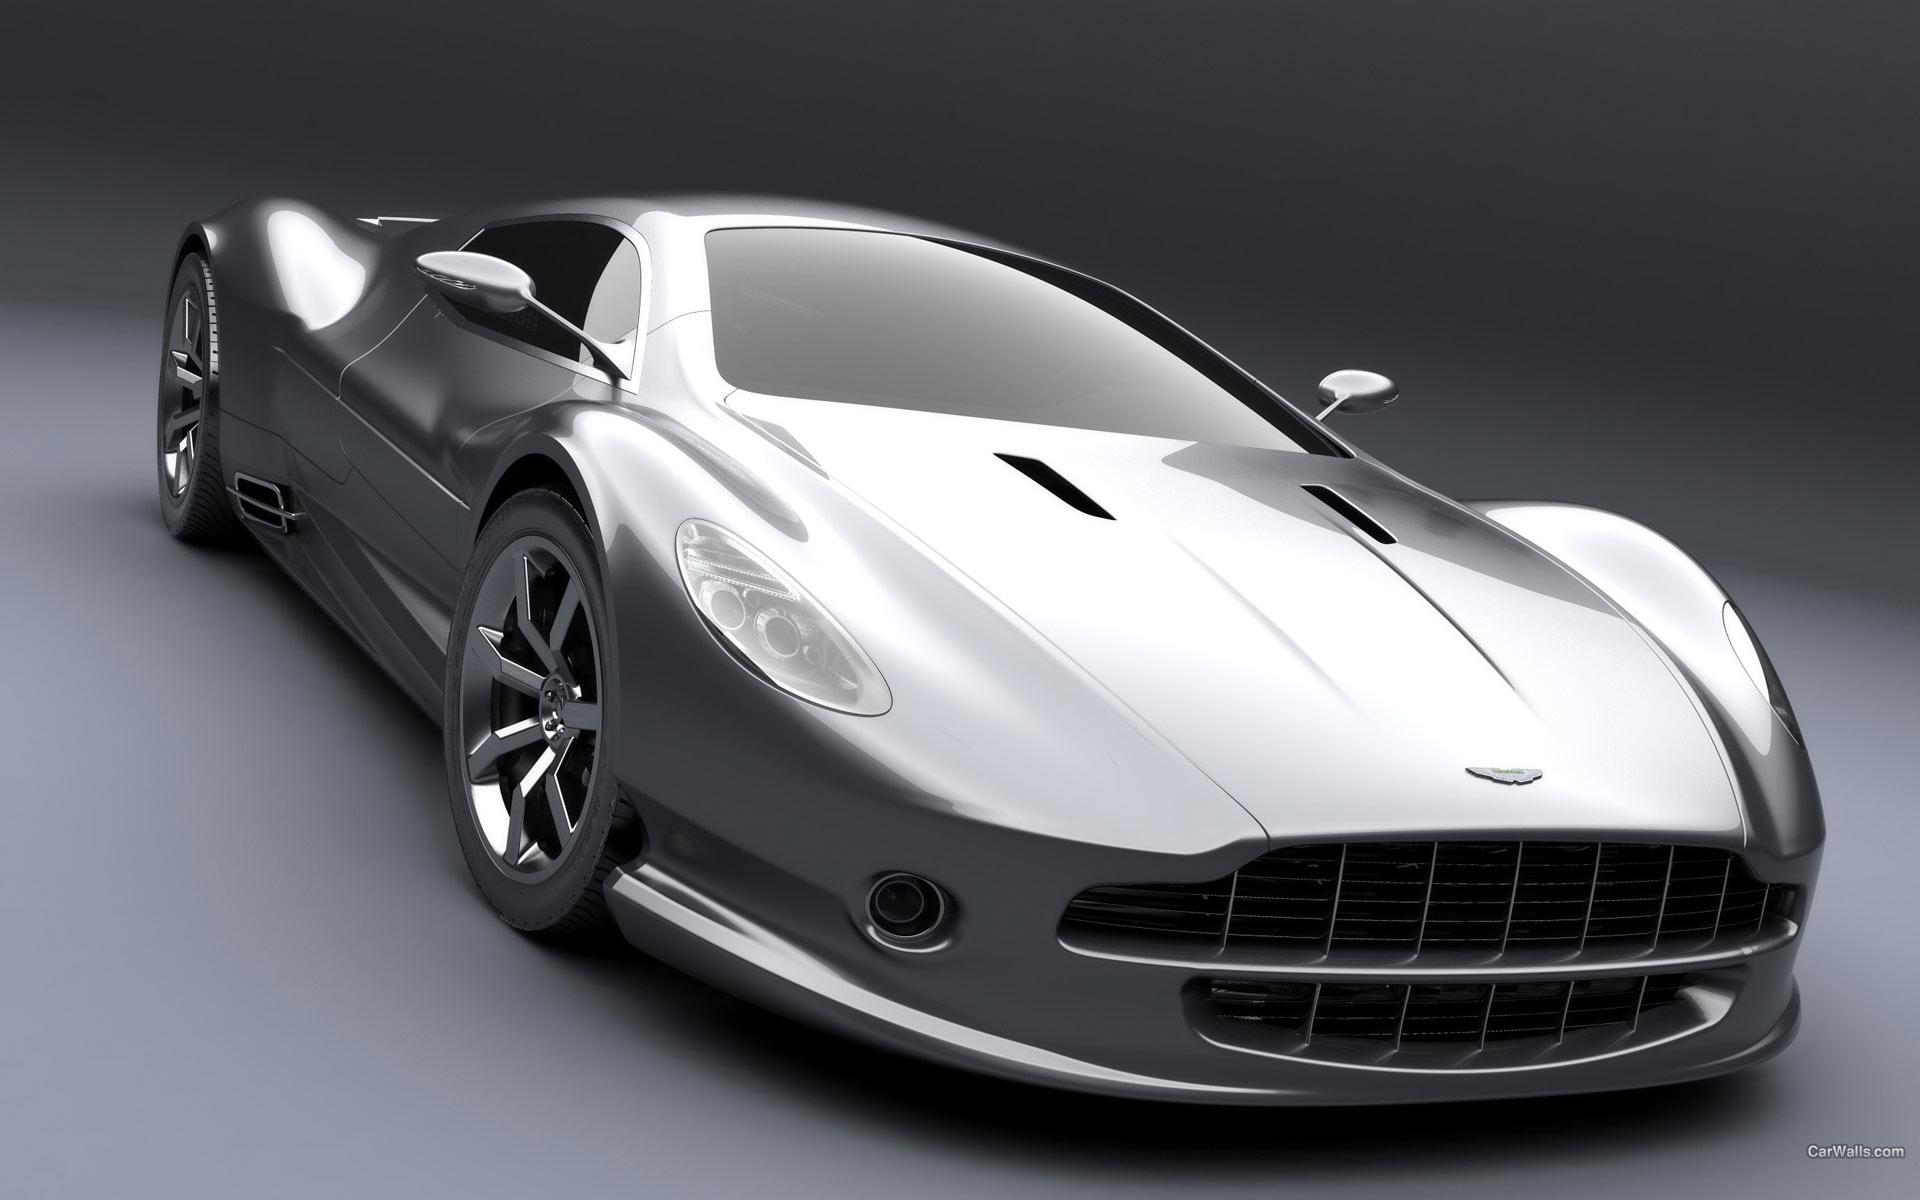 Aston Martin Cars 17 Free Wallpaper Hd Wallpaper Car